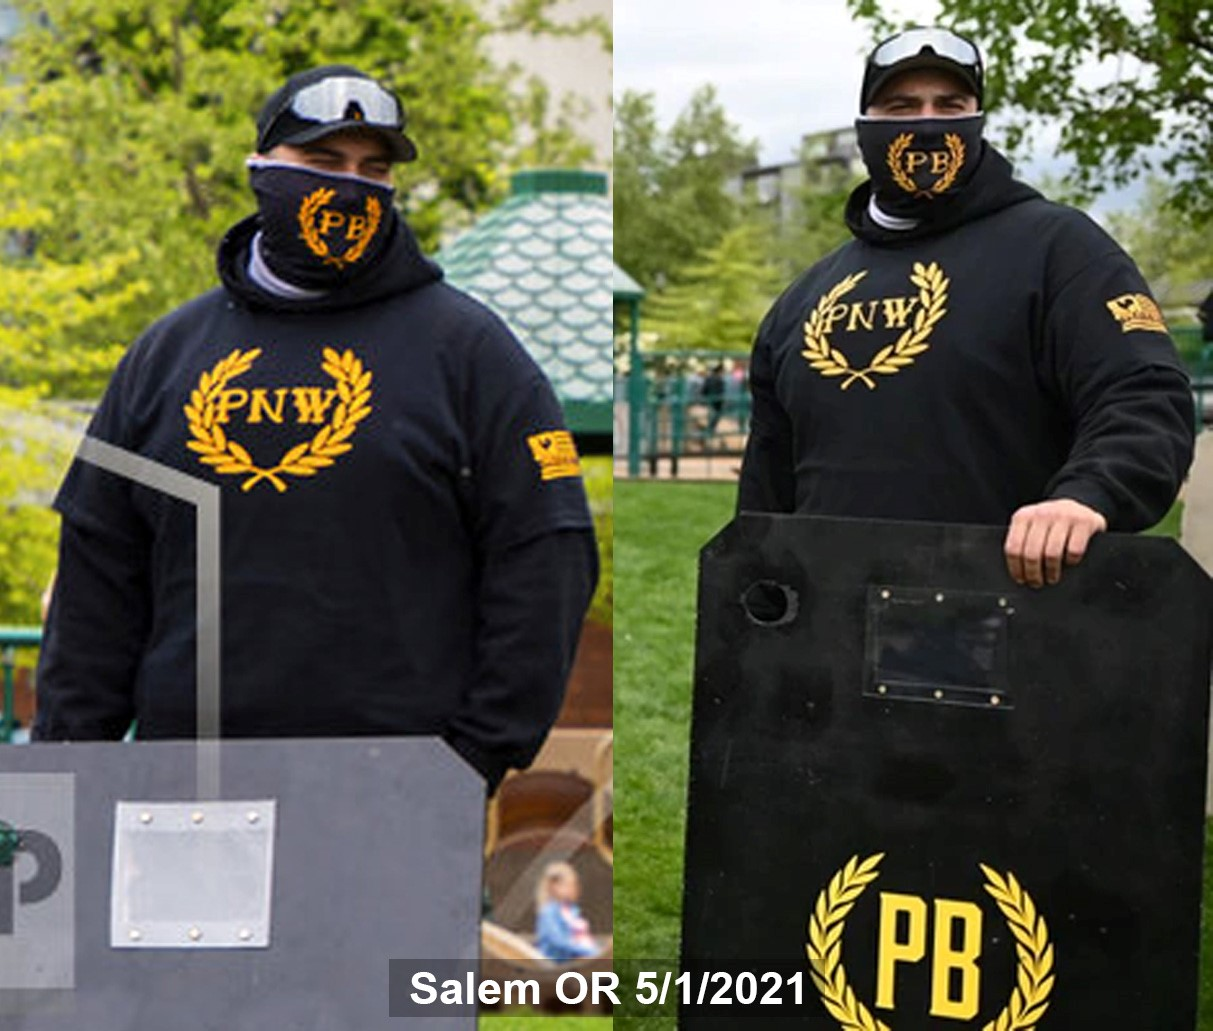 Travis Erickson stands near a Proud Boy shield on 5/1 in Salem.